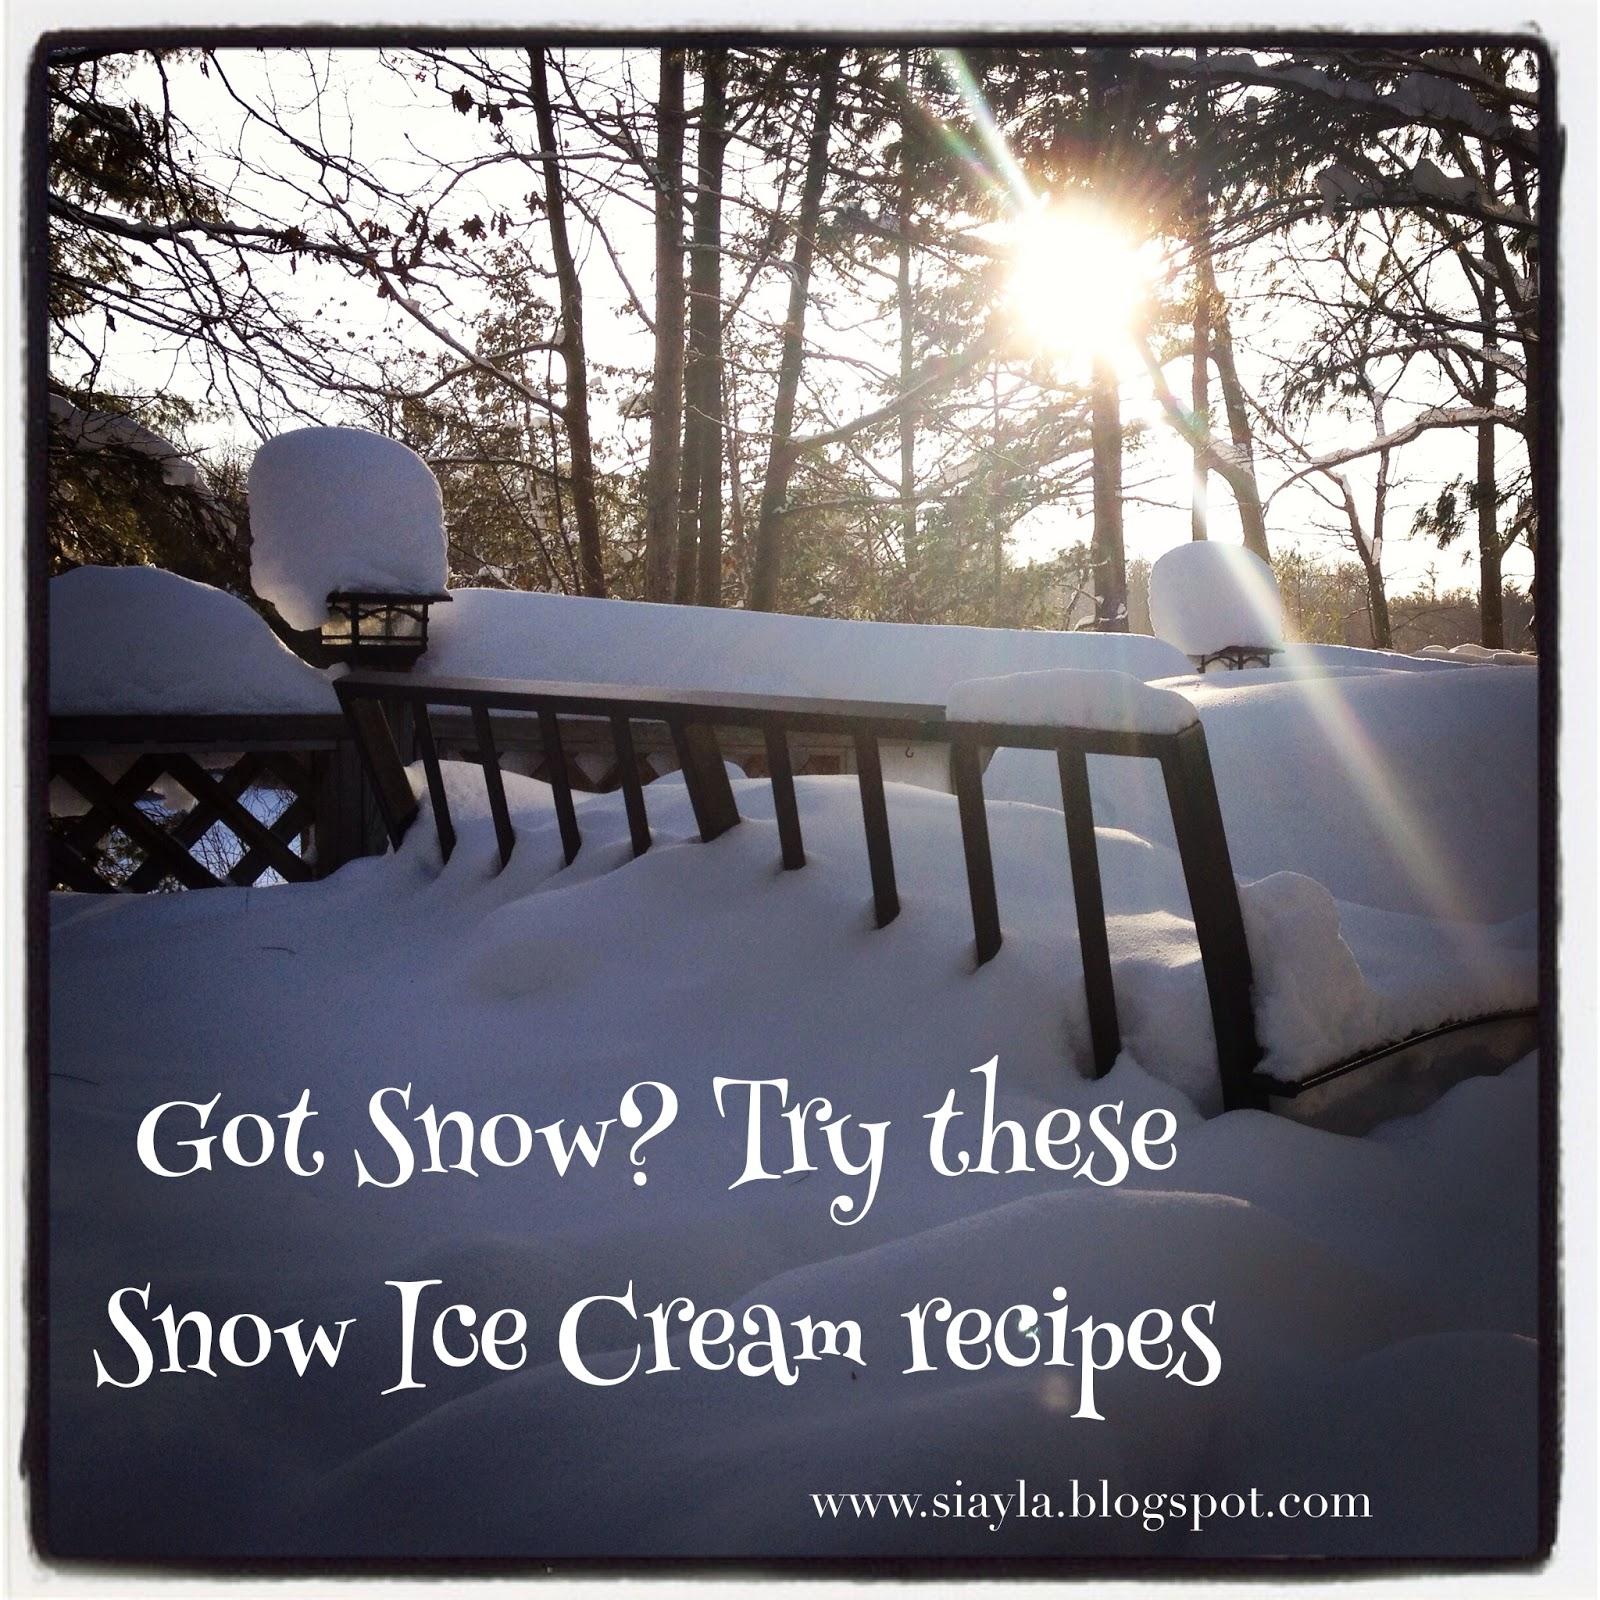 http://siayla.blogspot.ca/2014/01/got-snow-try-these-snow-ice-ceam-recipes.html